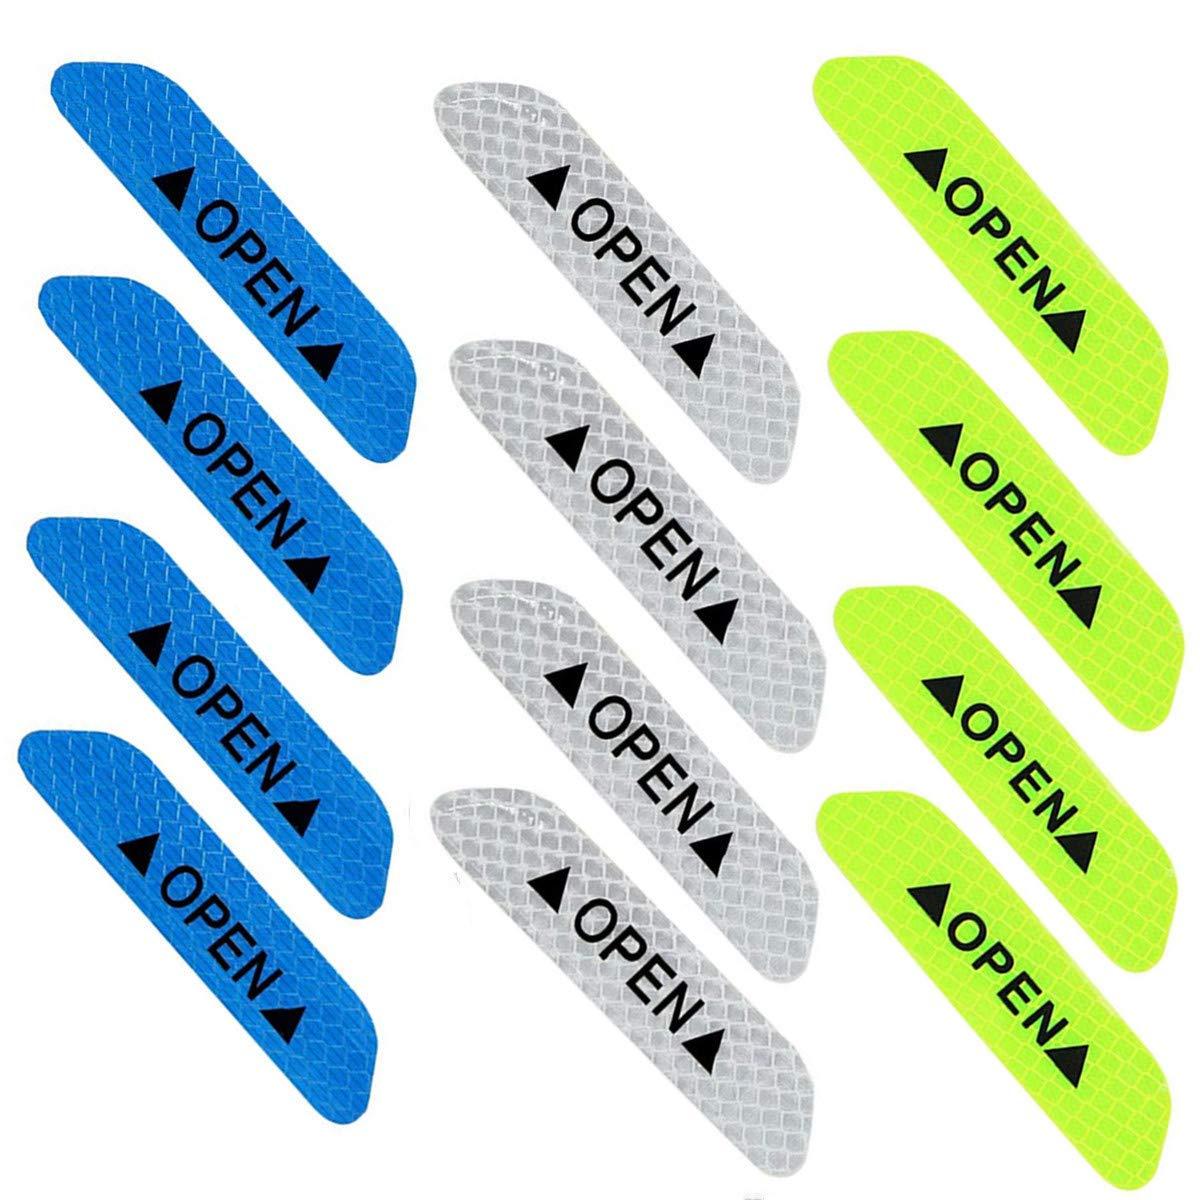 Wakaka 12 Pcs Universal Open Sign Reflective Open Sticker Waterproof Car Door Safety Warning Mark Tape Decal